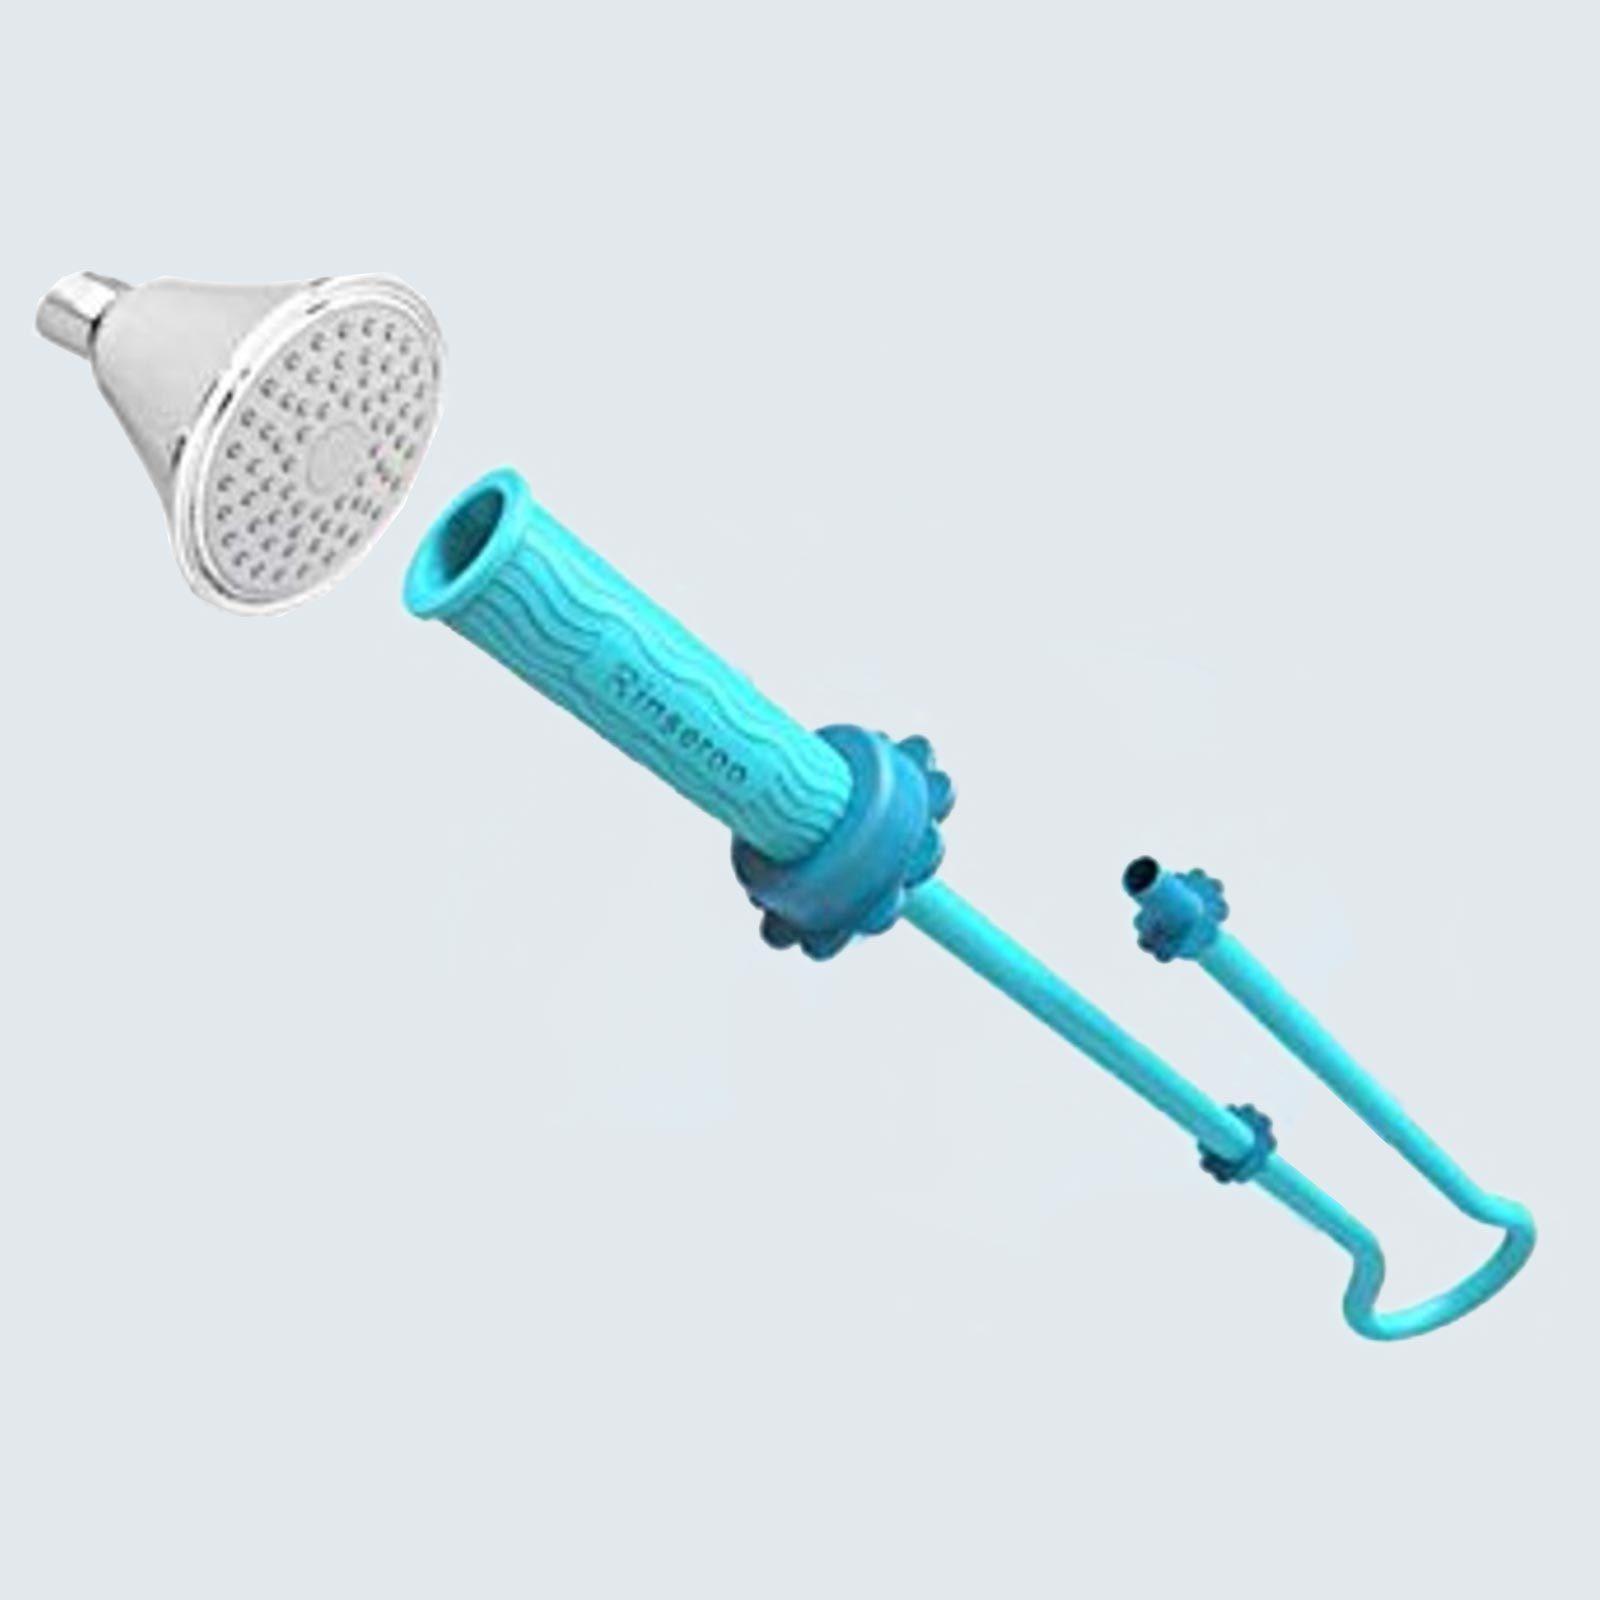 Rinseroo Slip-On Shower Head Attachment Hose